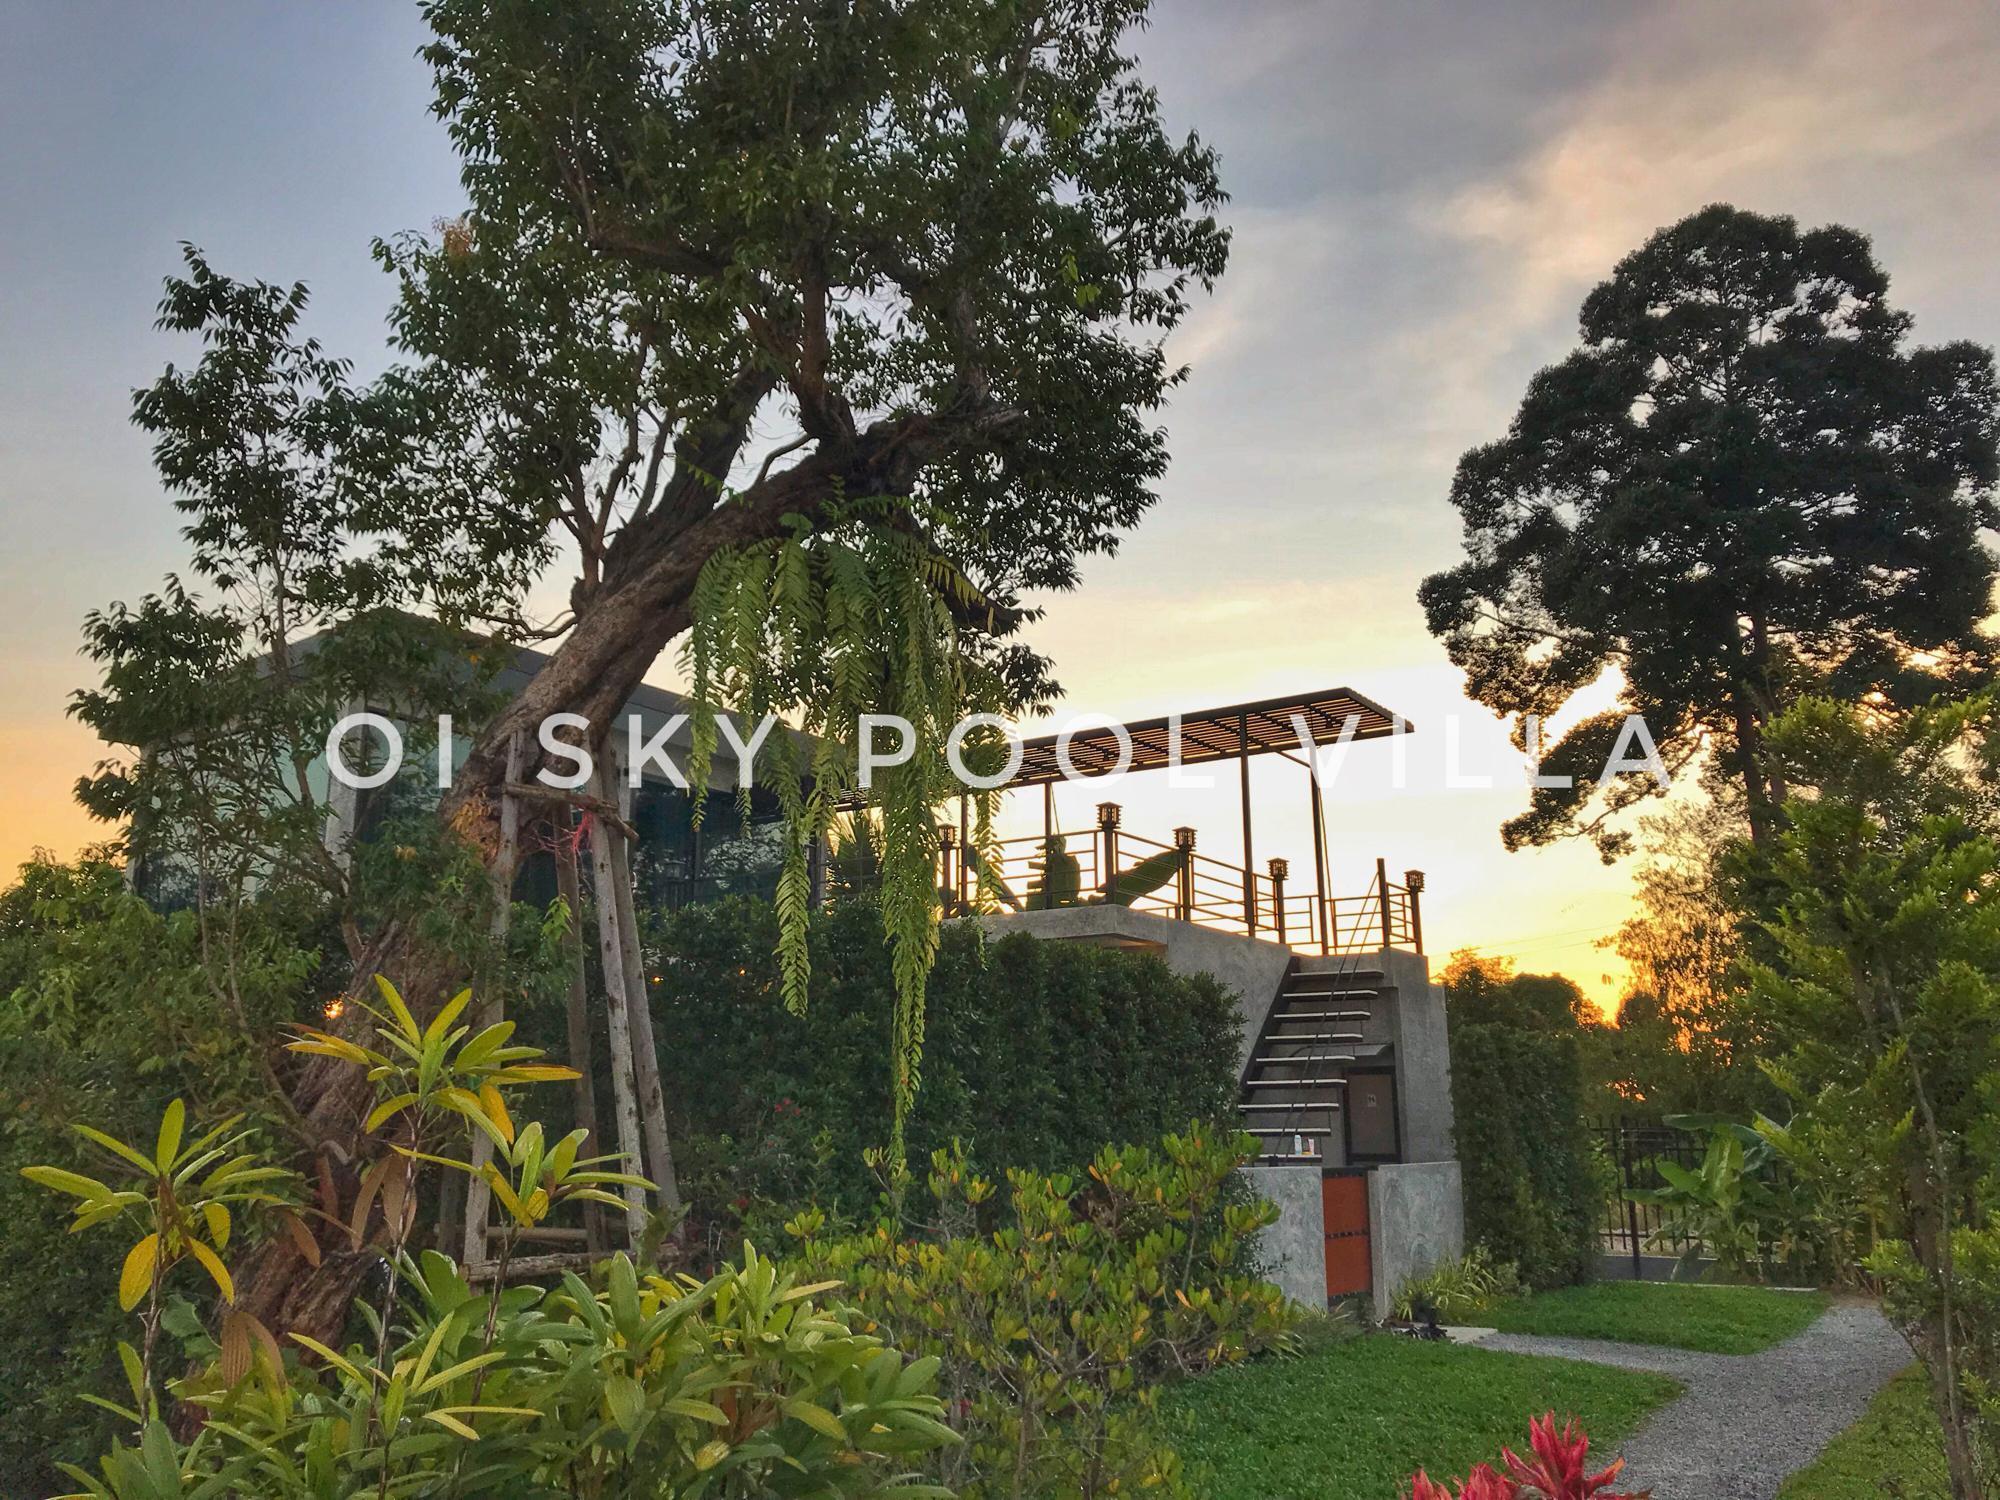 OI Sky Pool Villa วิลลา 3 ห้องนอน 3 ห้องน้ำส่วนตัว ขนาด 180 ตร.ม. – บ้านฉาง